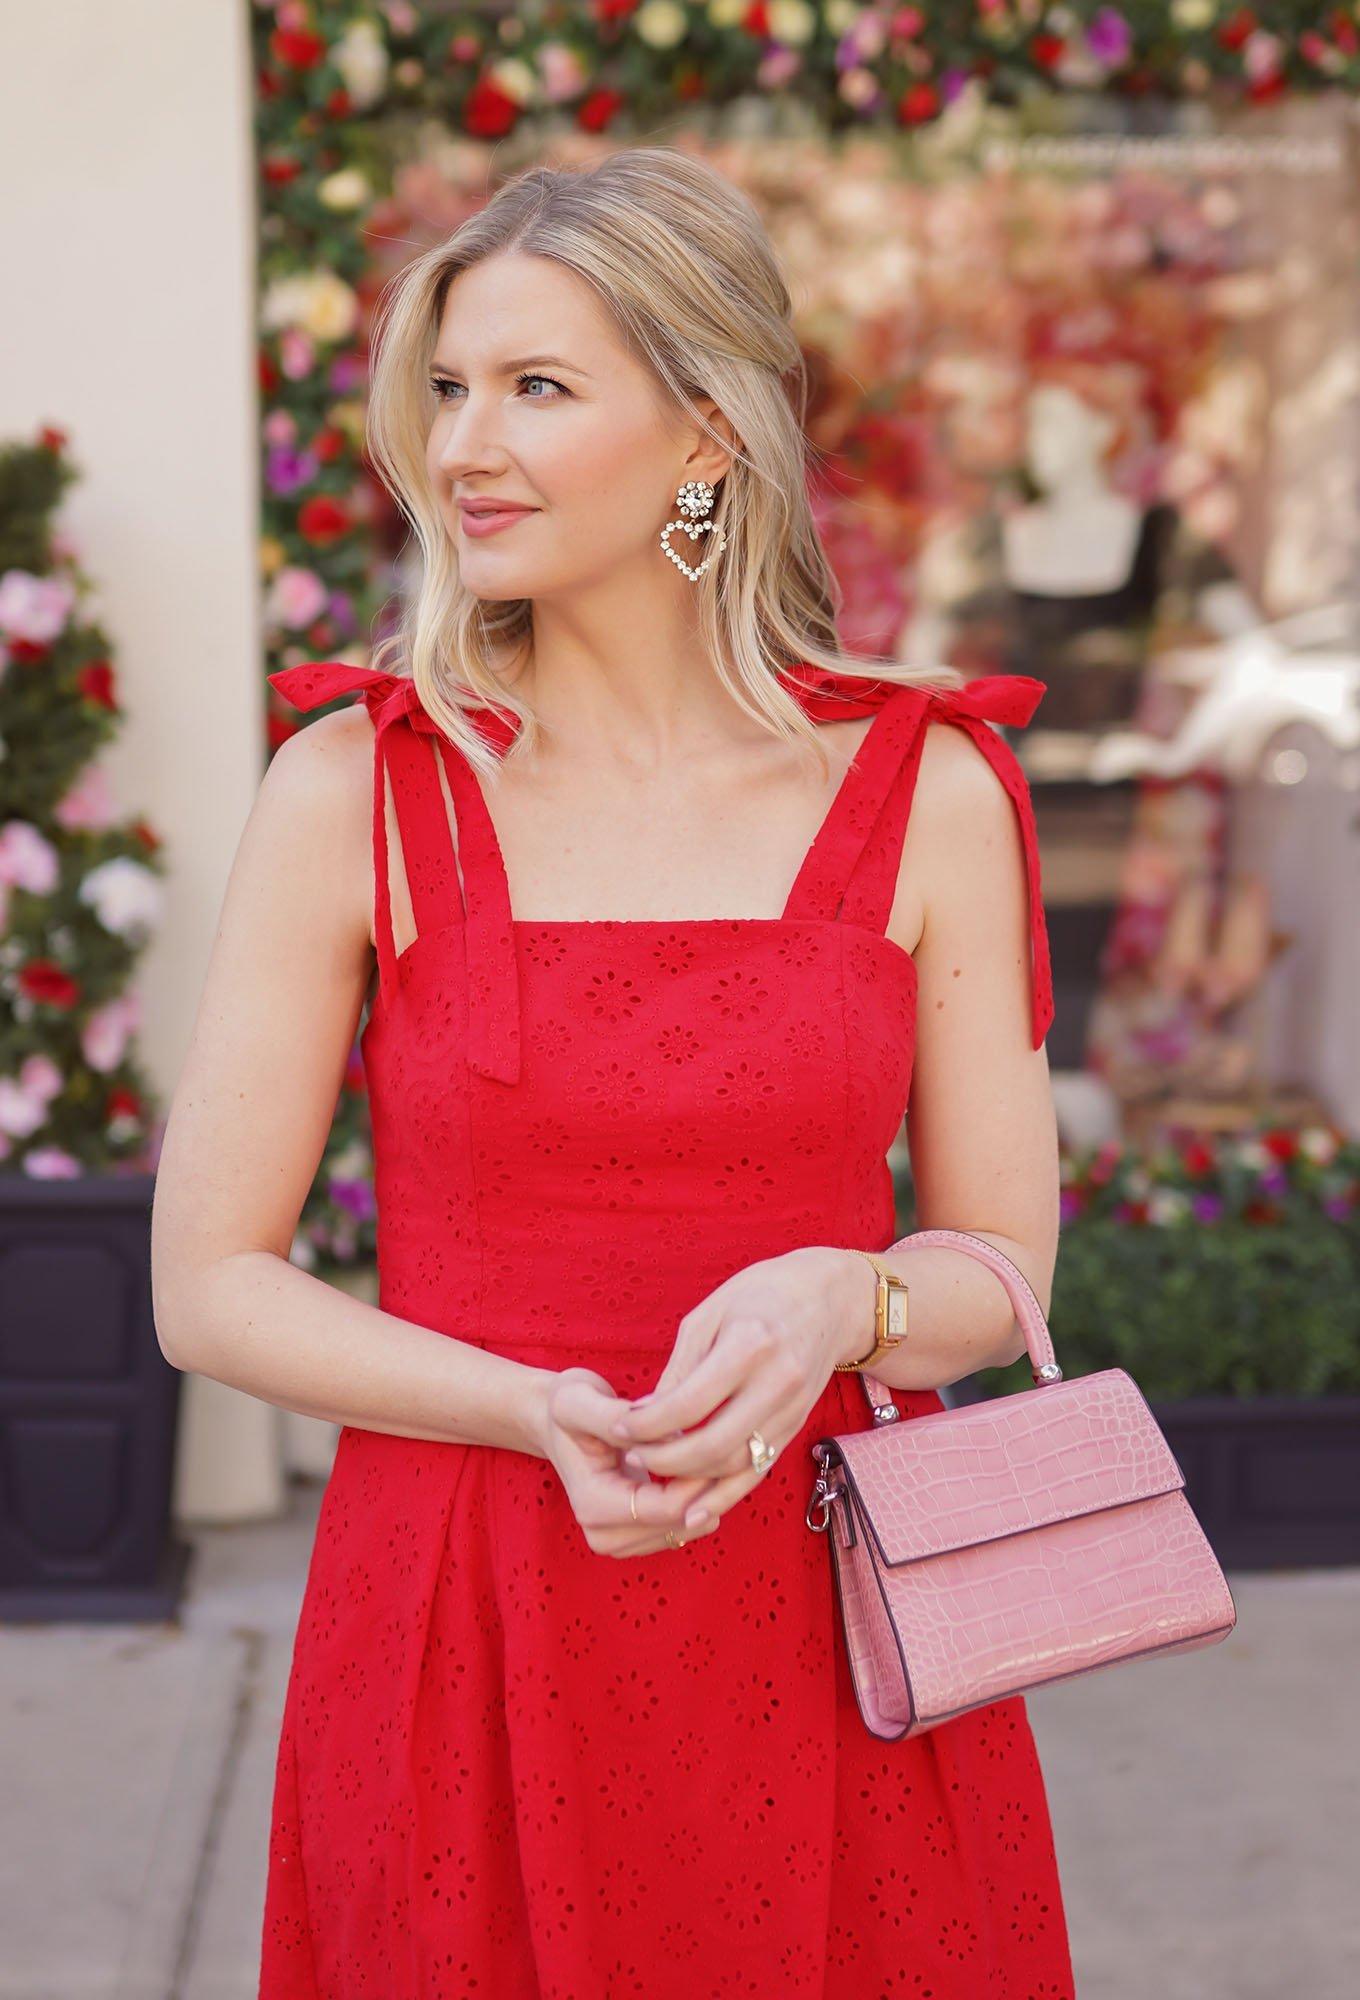 Ashley Brooke - Valentines Red Dress - 1